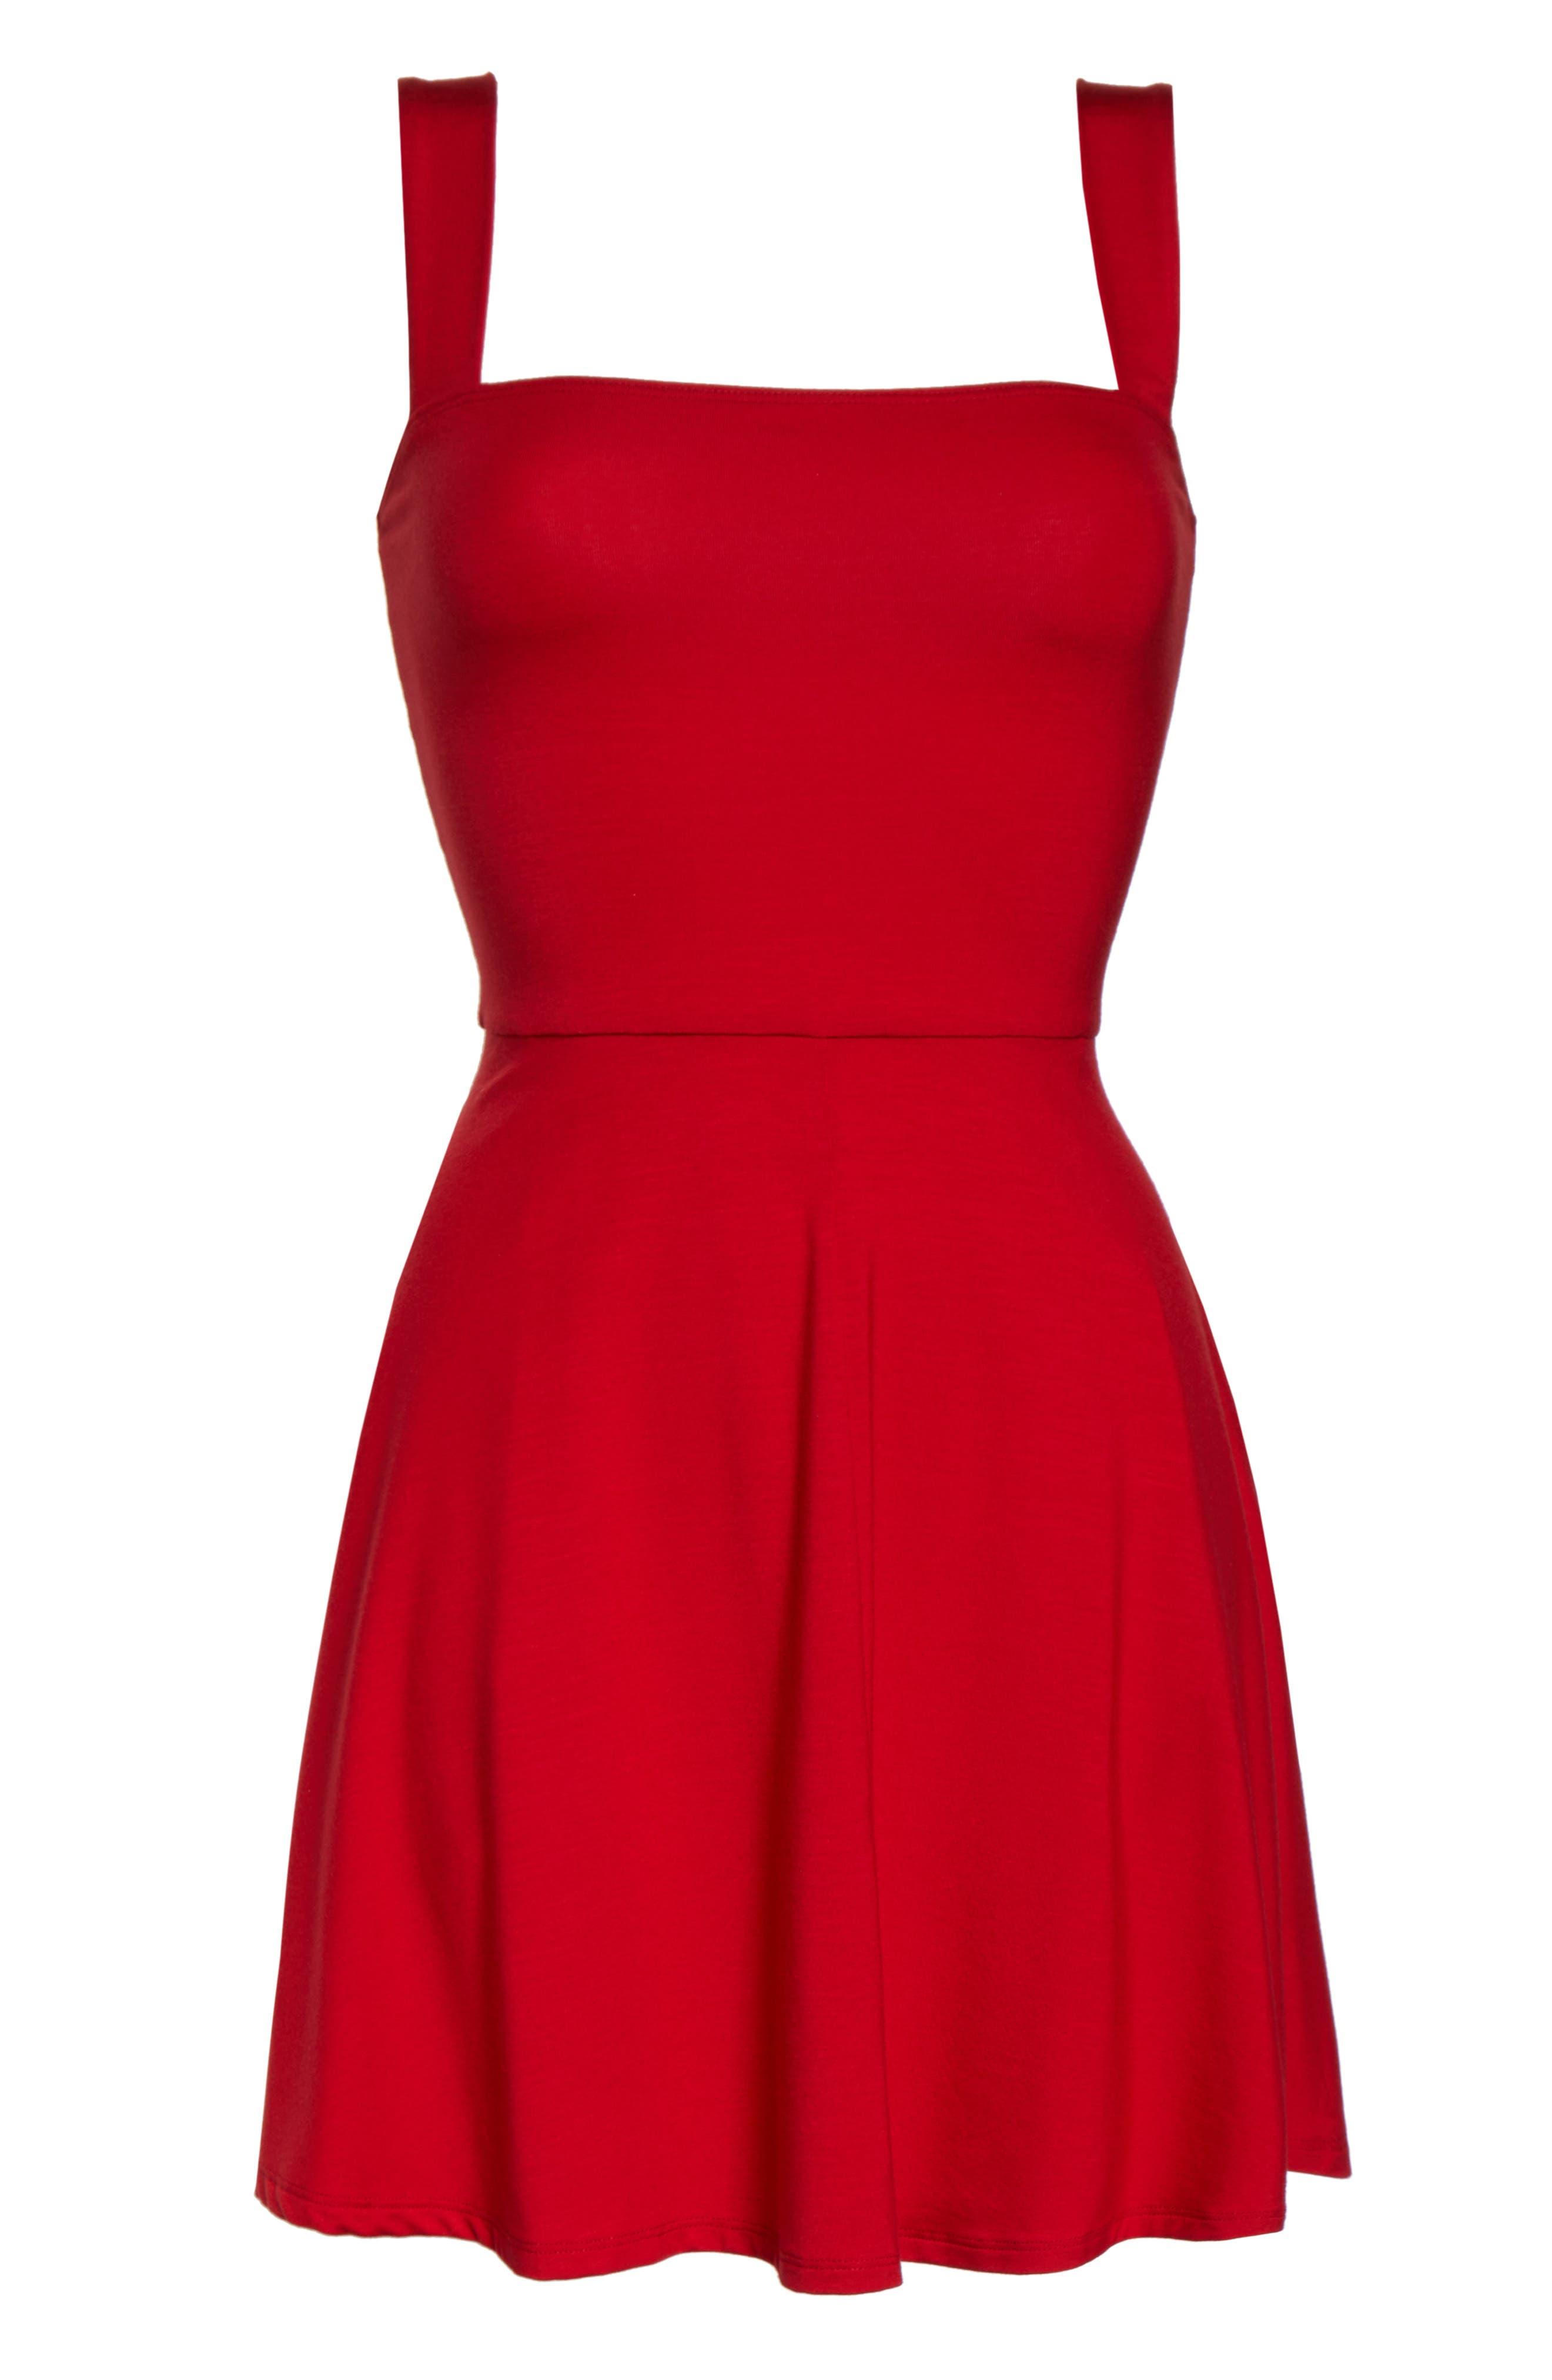 Reformation Anicka Square Neck Skater Dress, Red